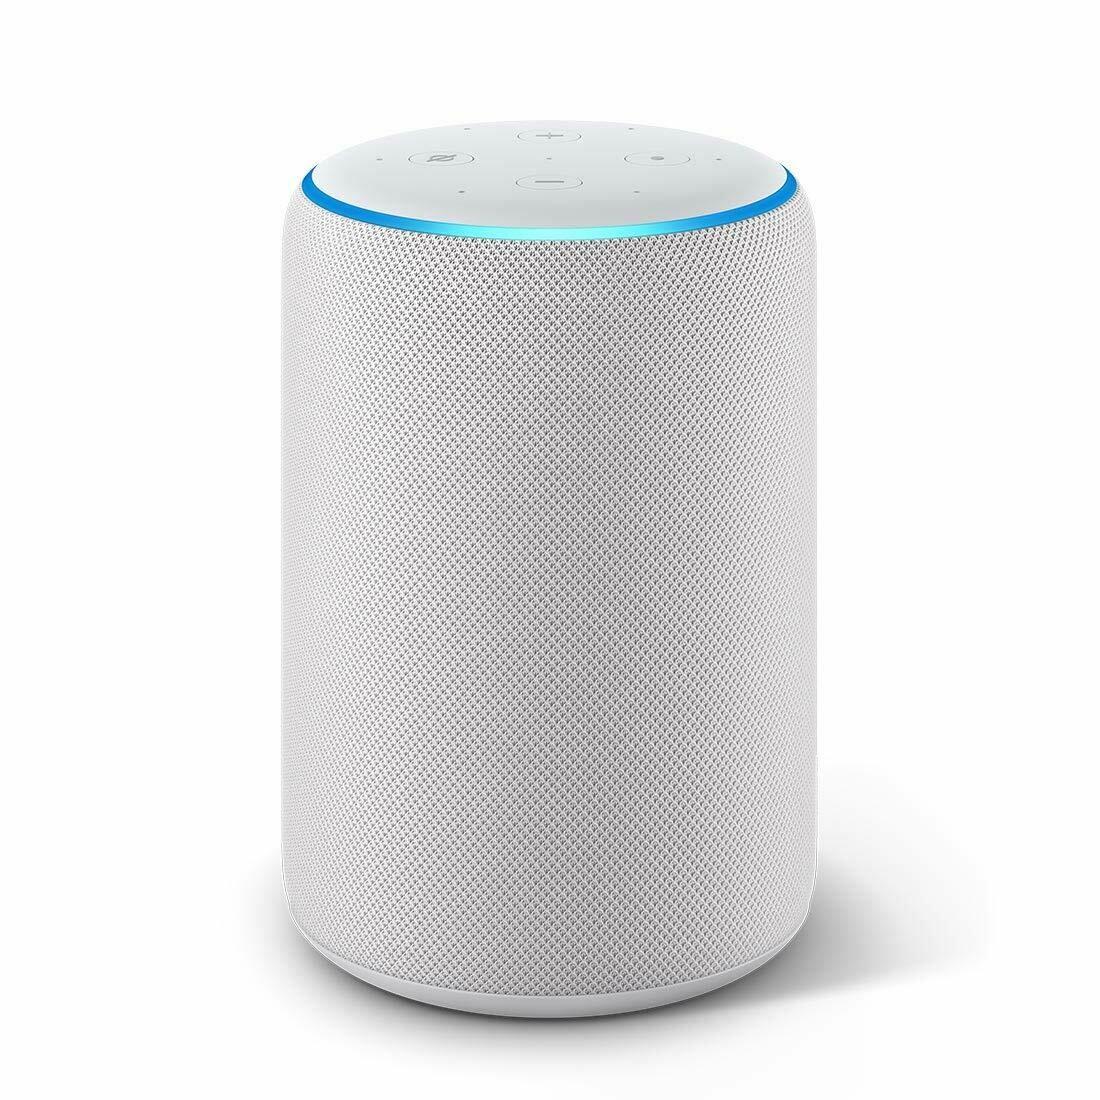 Amazon Echo, 3rd Generation, White